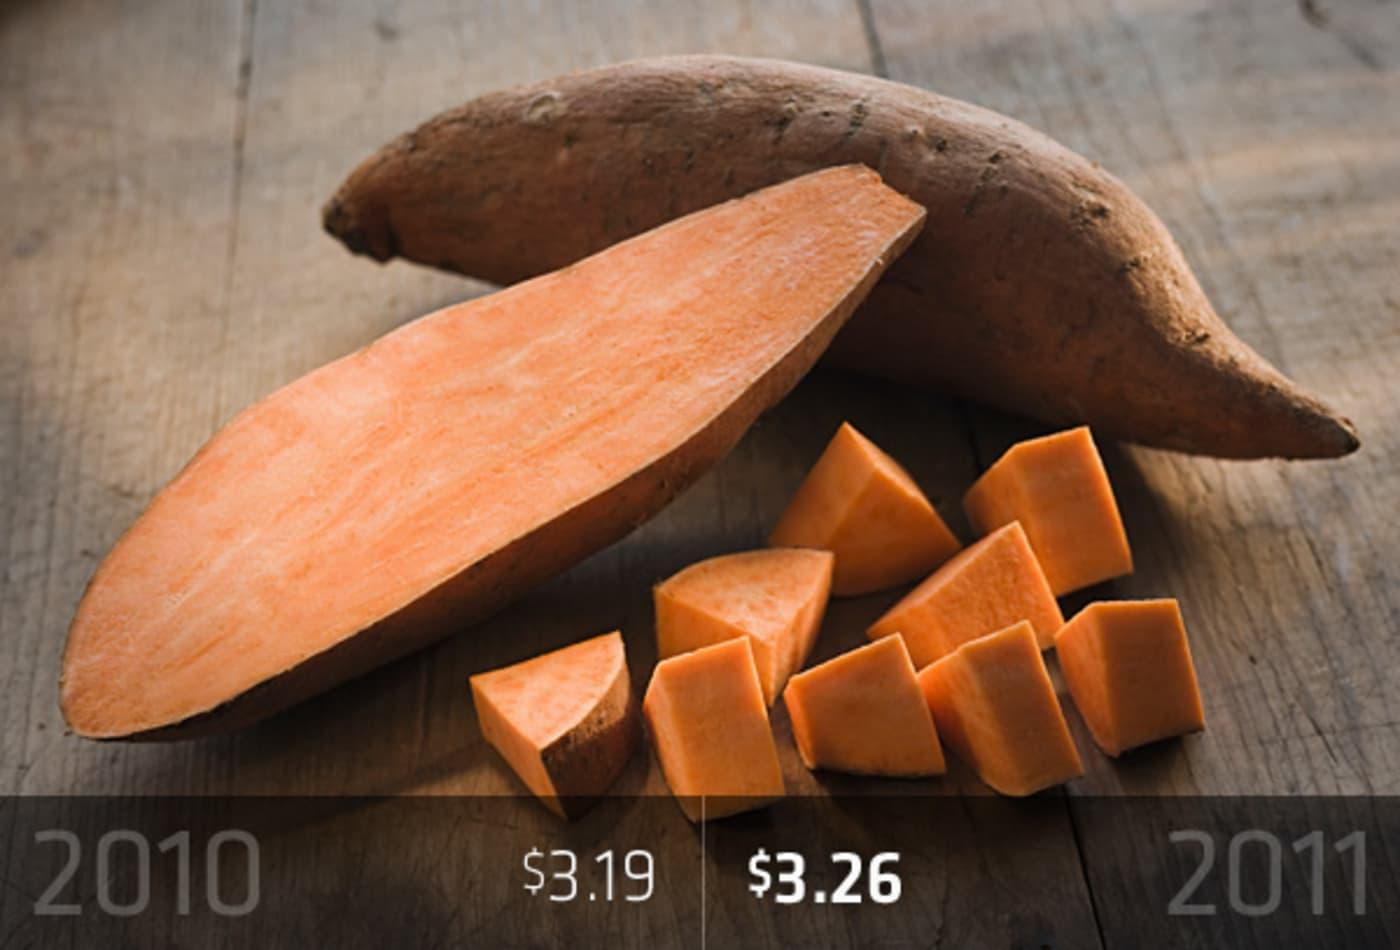 45358615 cost-of-thanksgiving-cnbc-2011-sweetpotatoes.jpg